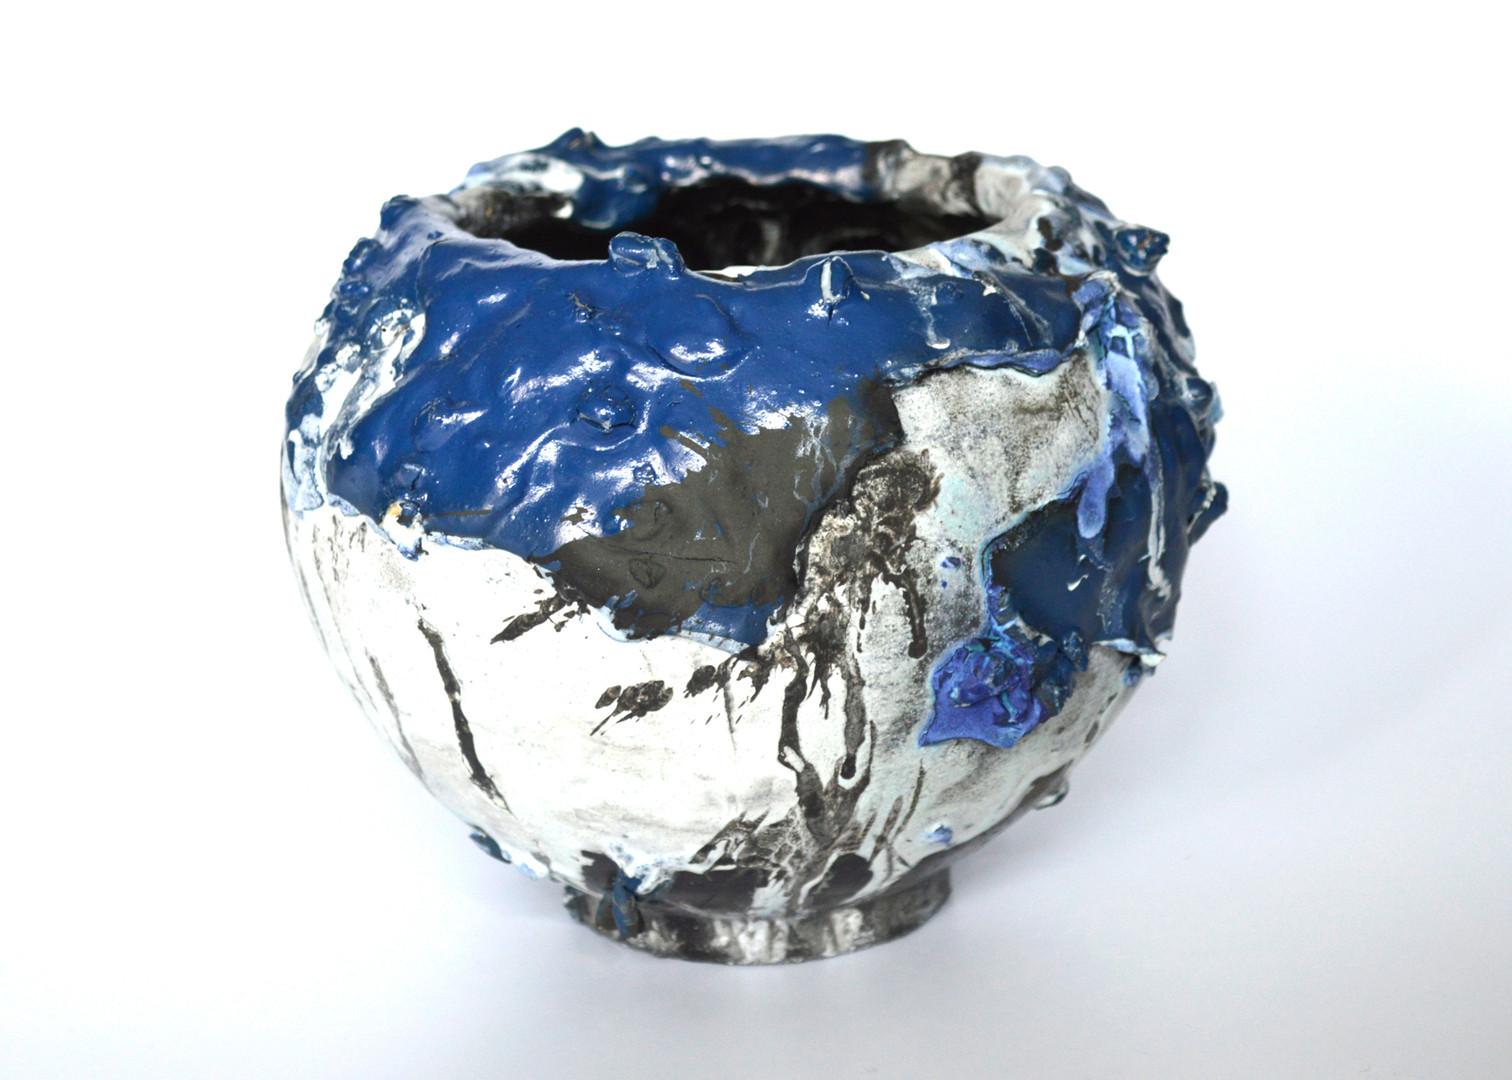 Pam-Space-Dog-Moon-Jar-Blue-White-1.jpg